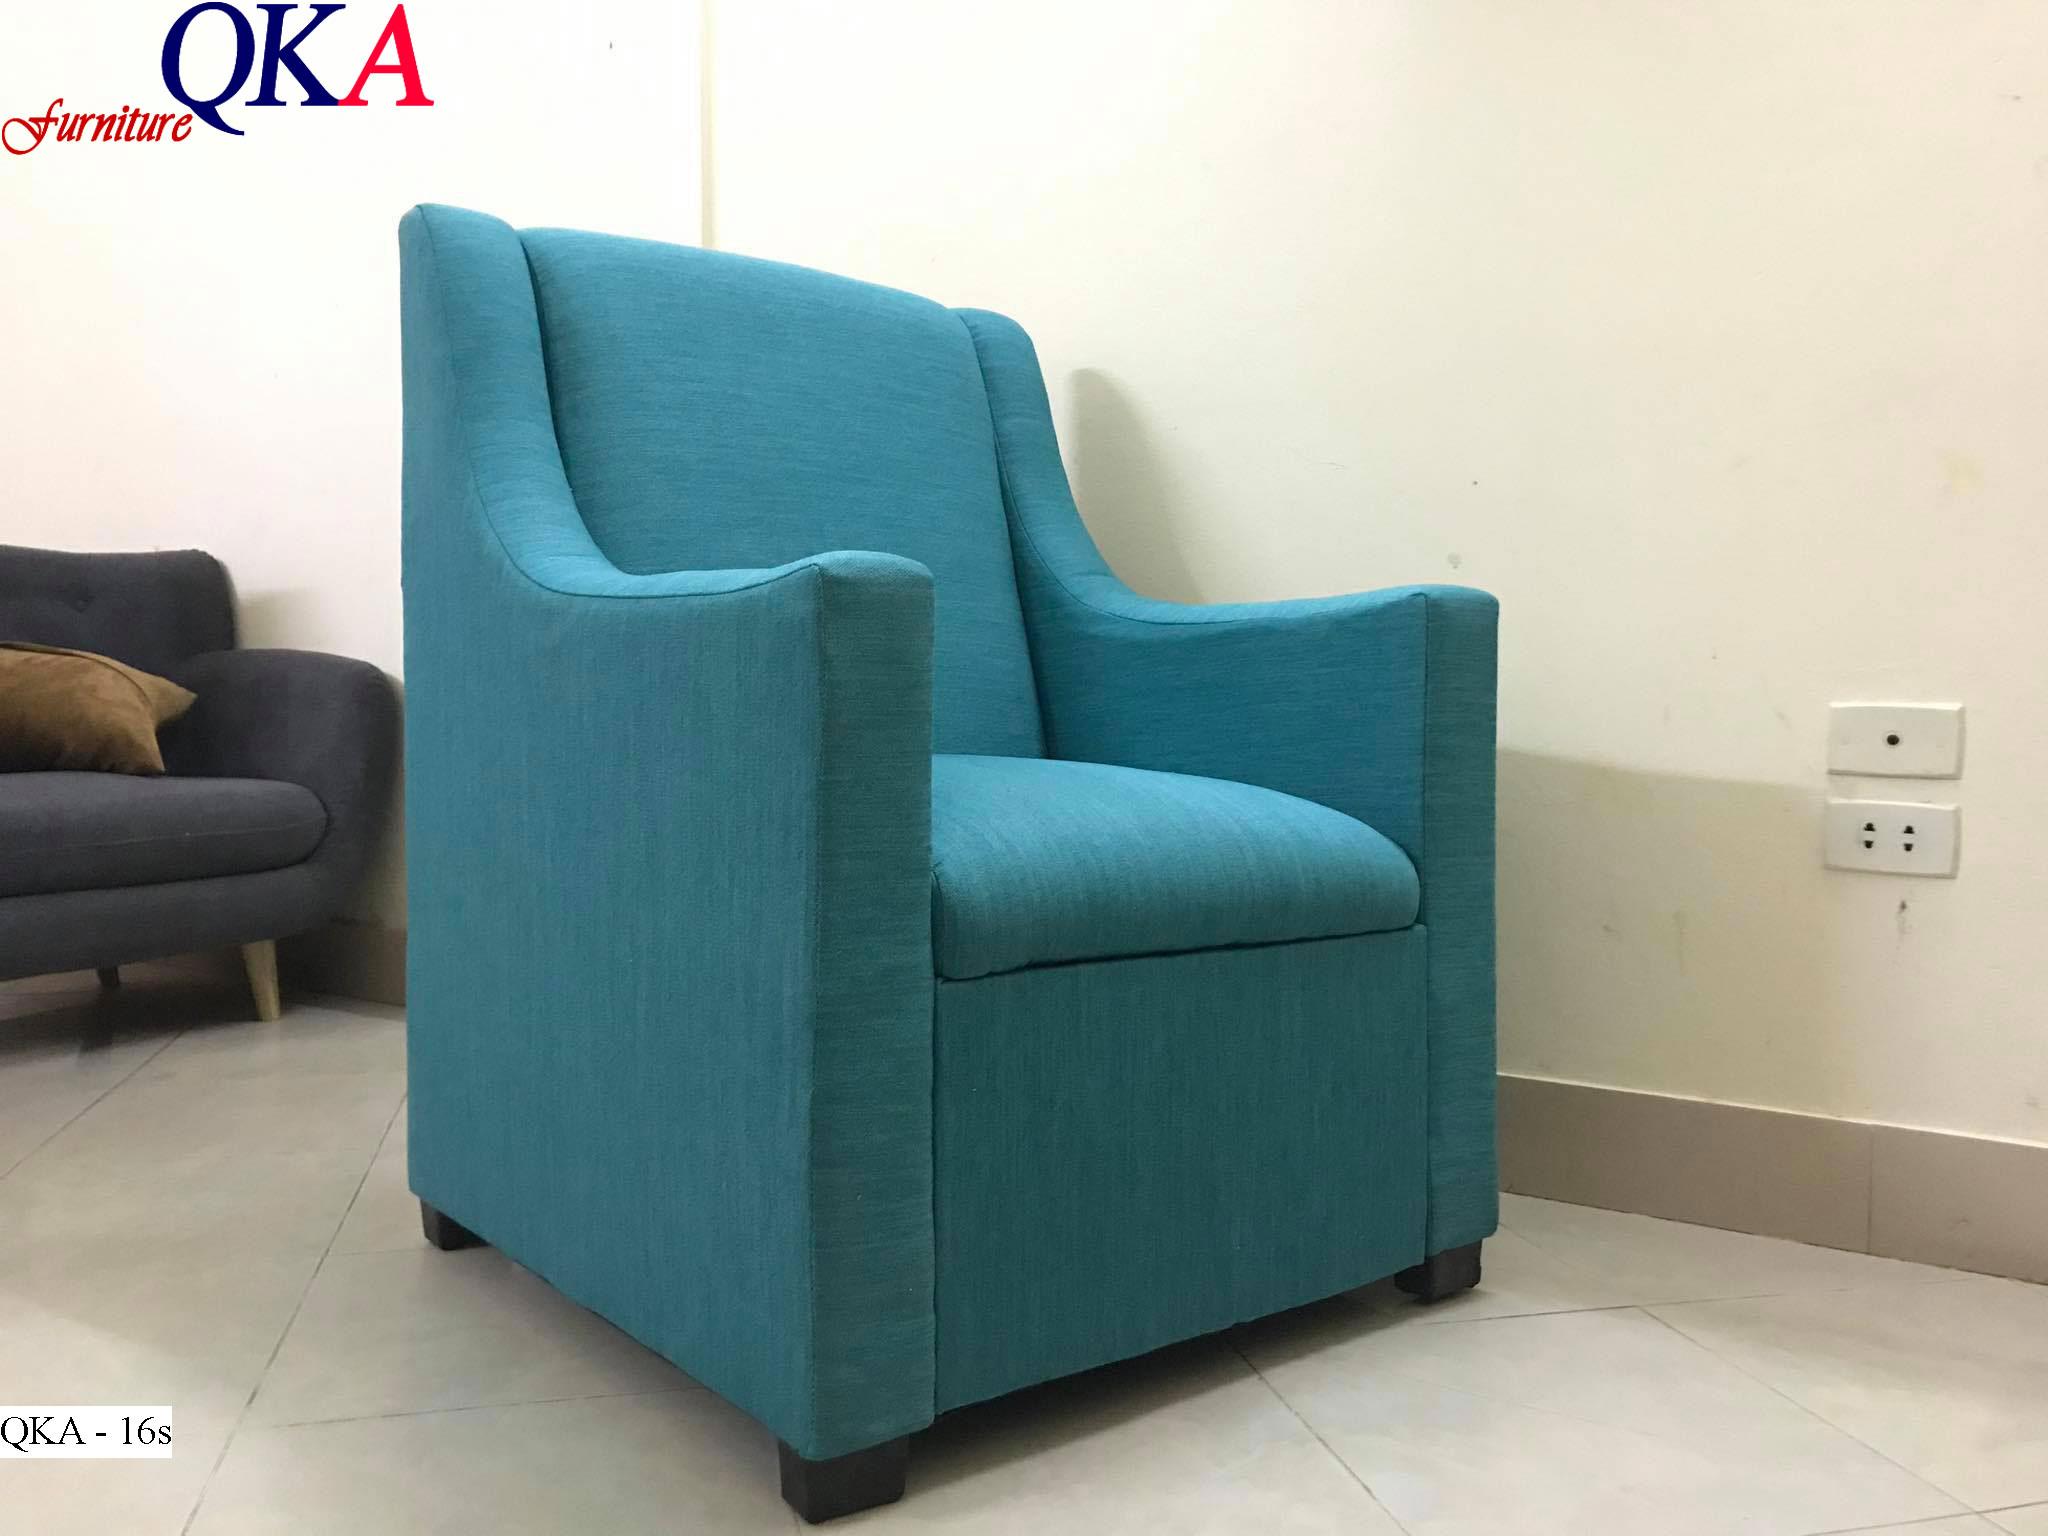 Ghế sofa đơn – QKA 16s